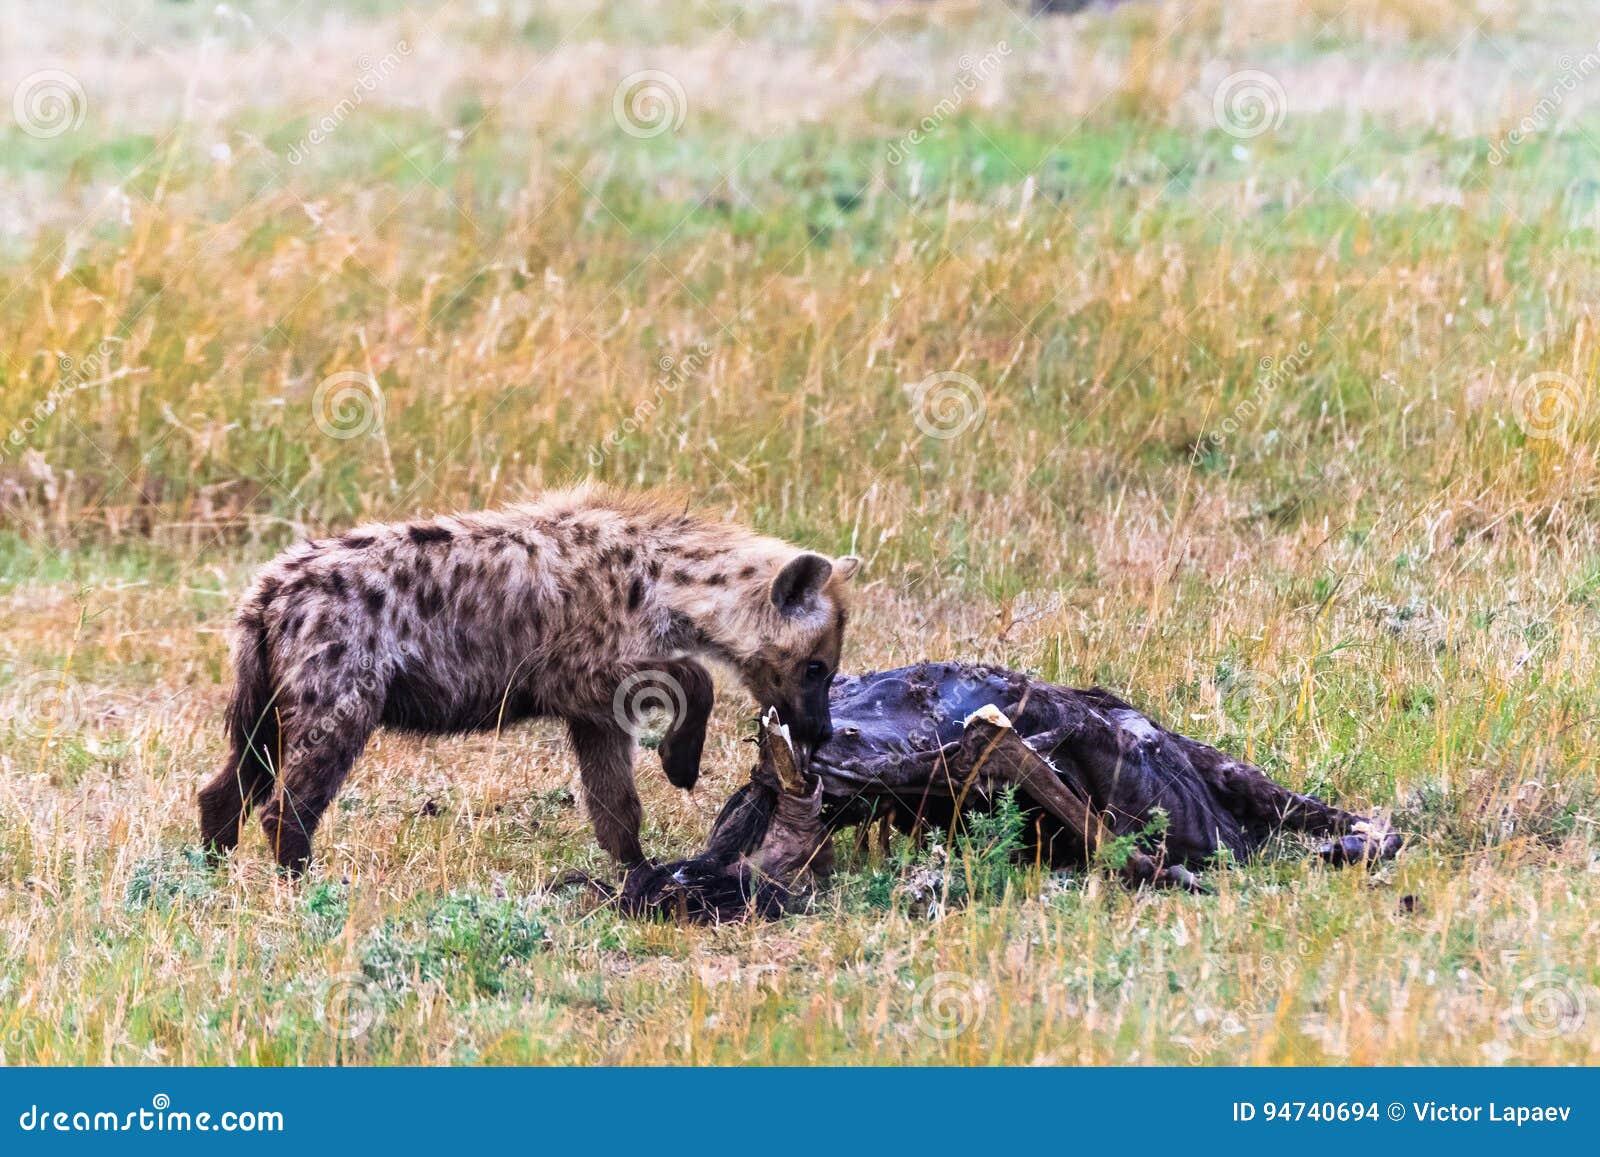 Spotted hyena in savanna with prey. Masai Mara